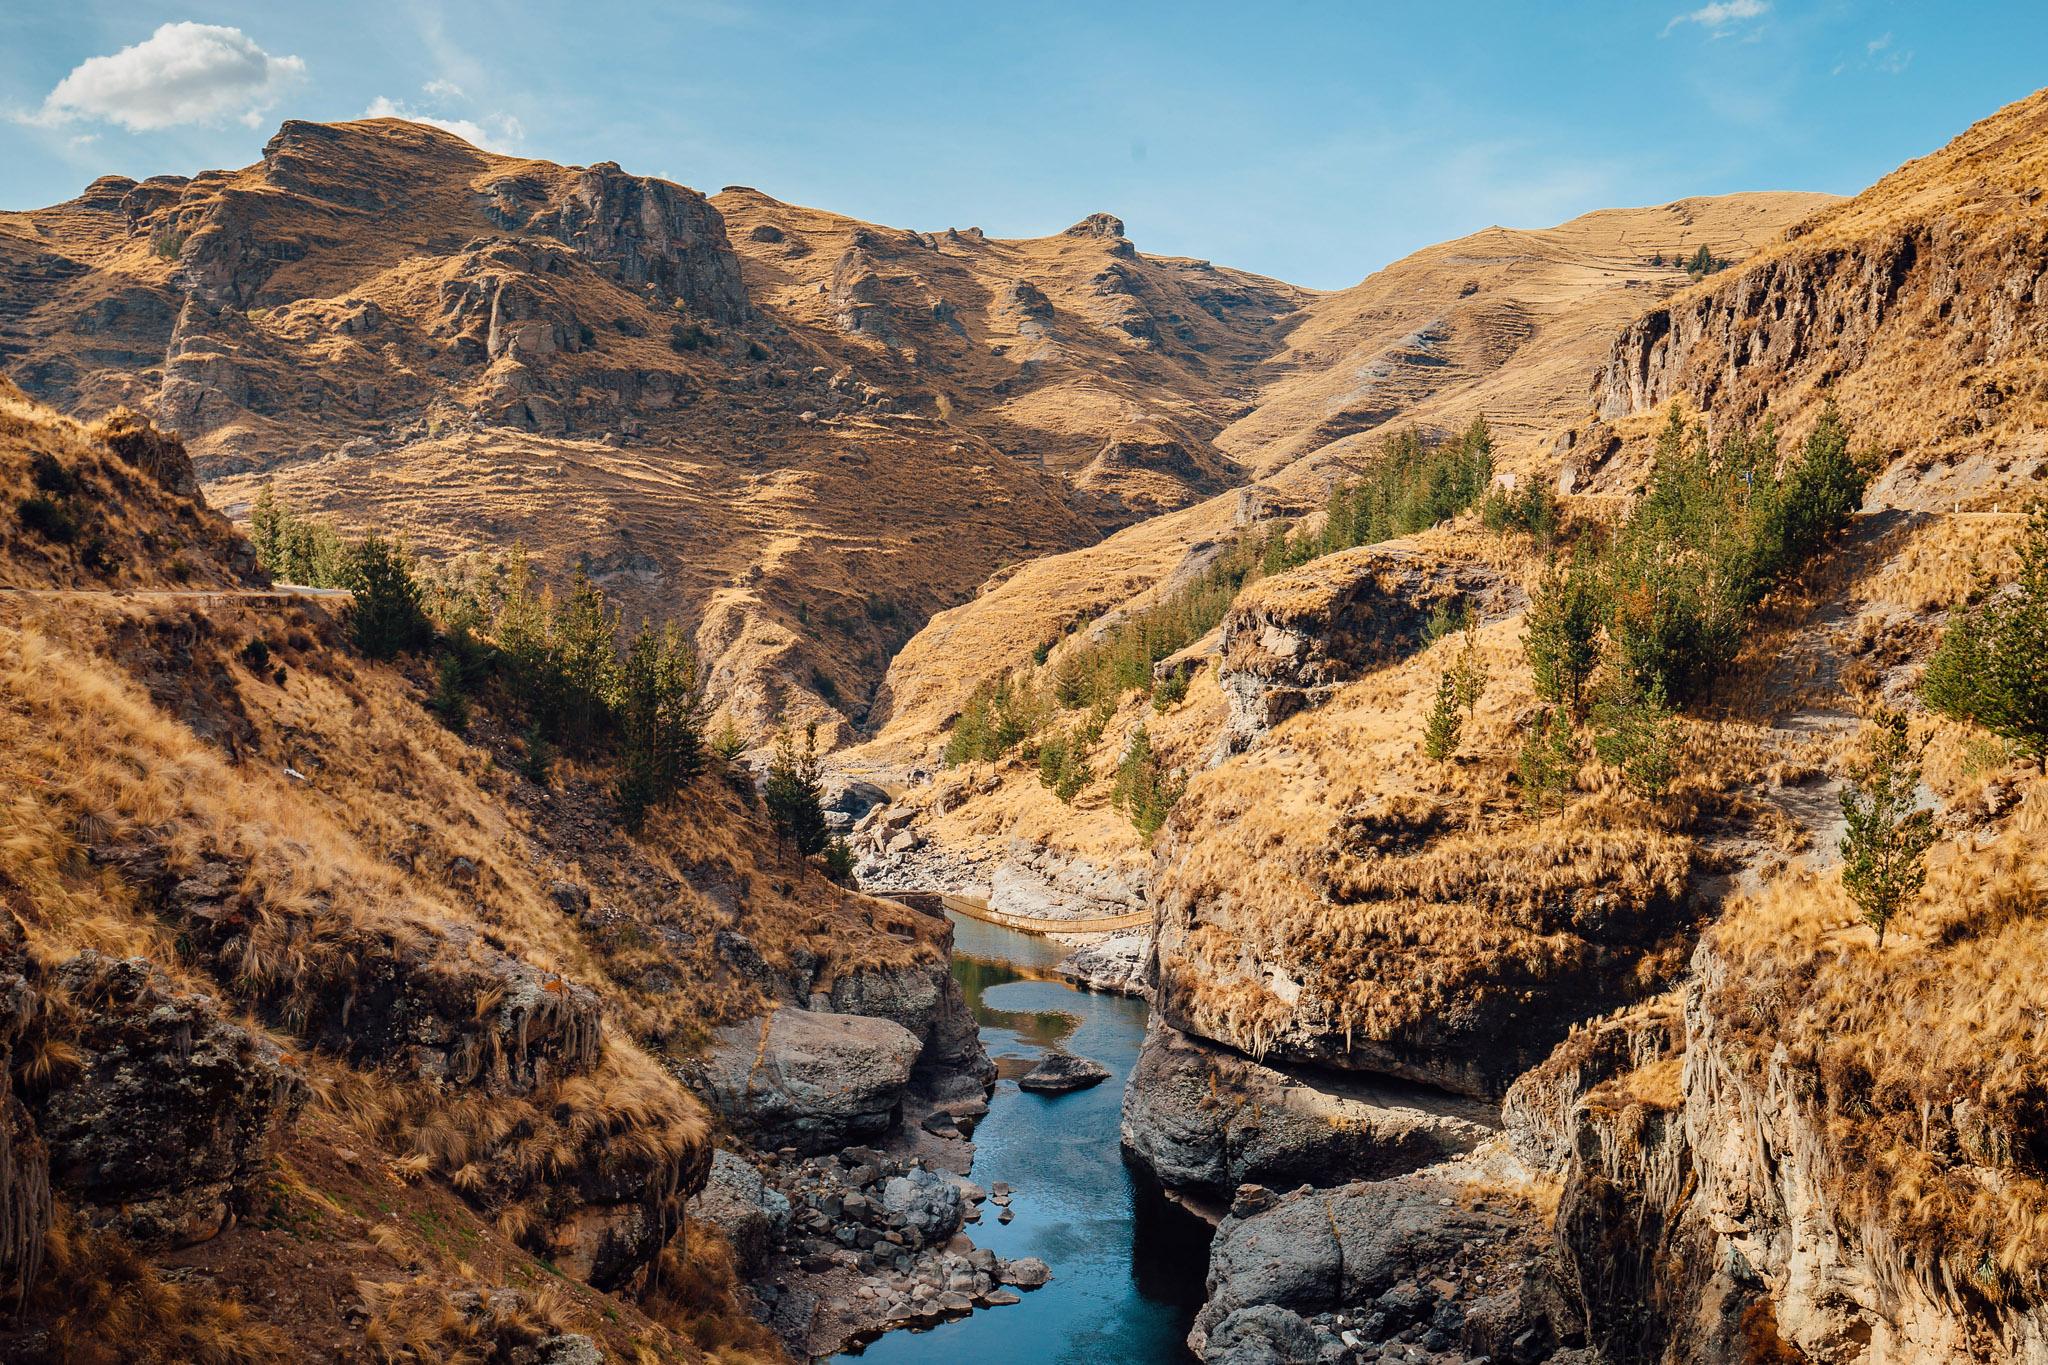 travel-photography-overlanding-apurimac-valley-peru-queswachaka-last-inca-bridge-4.jpg